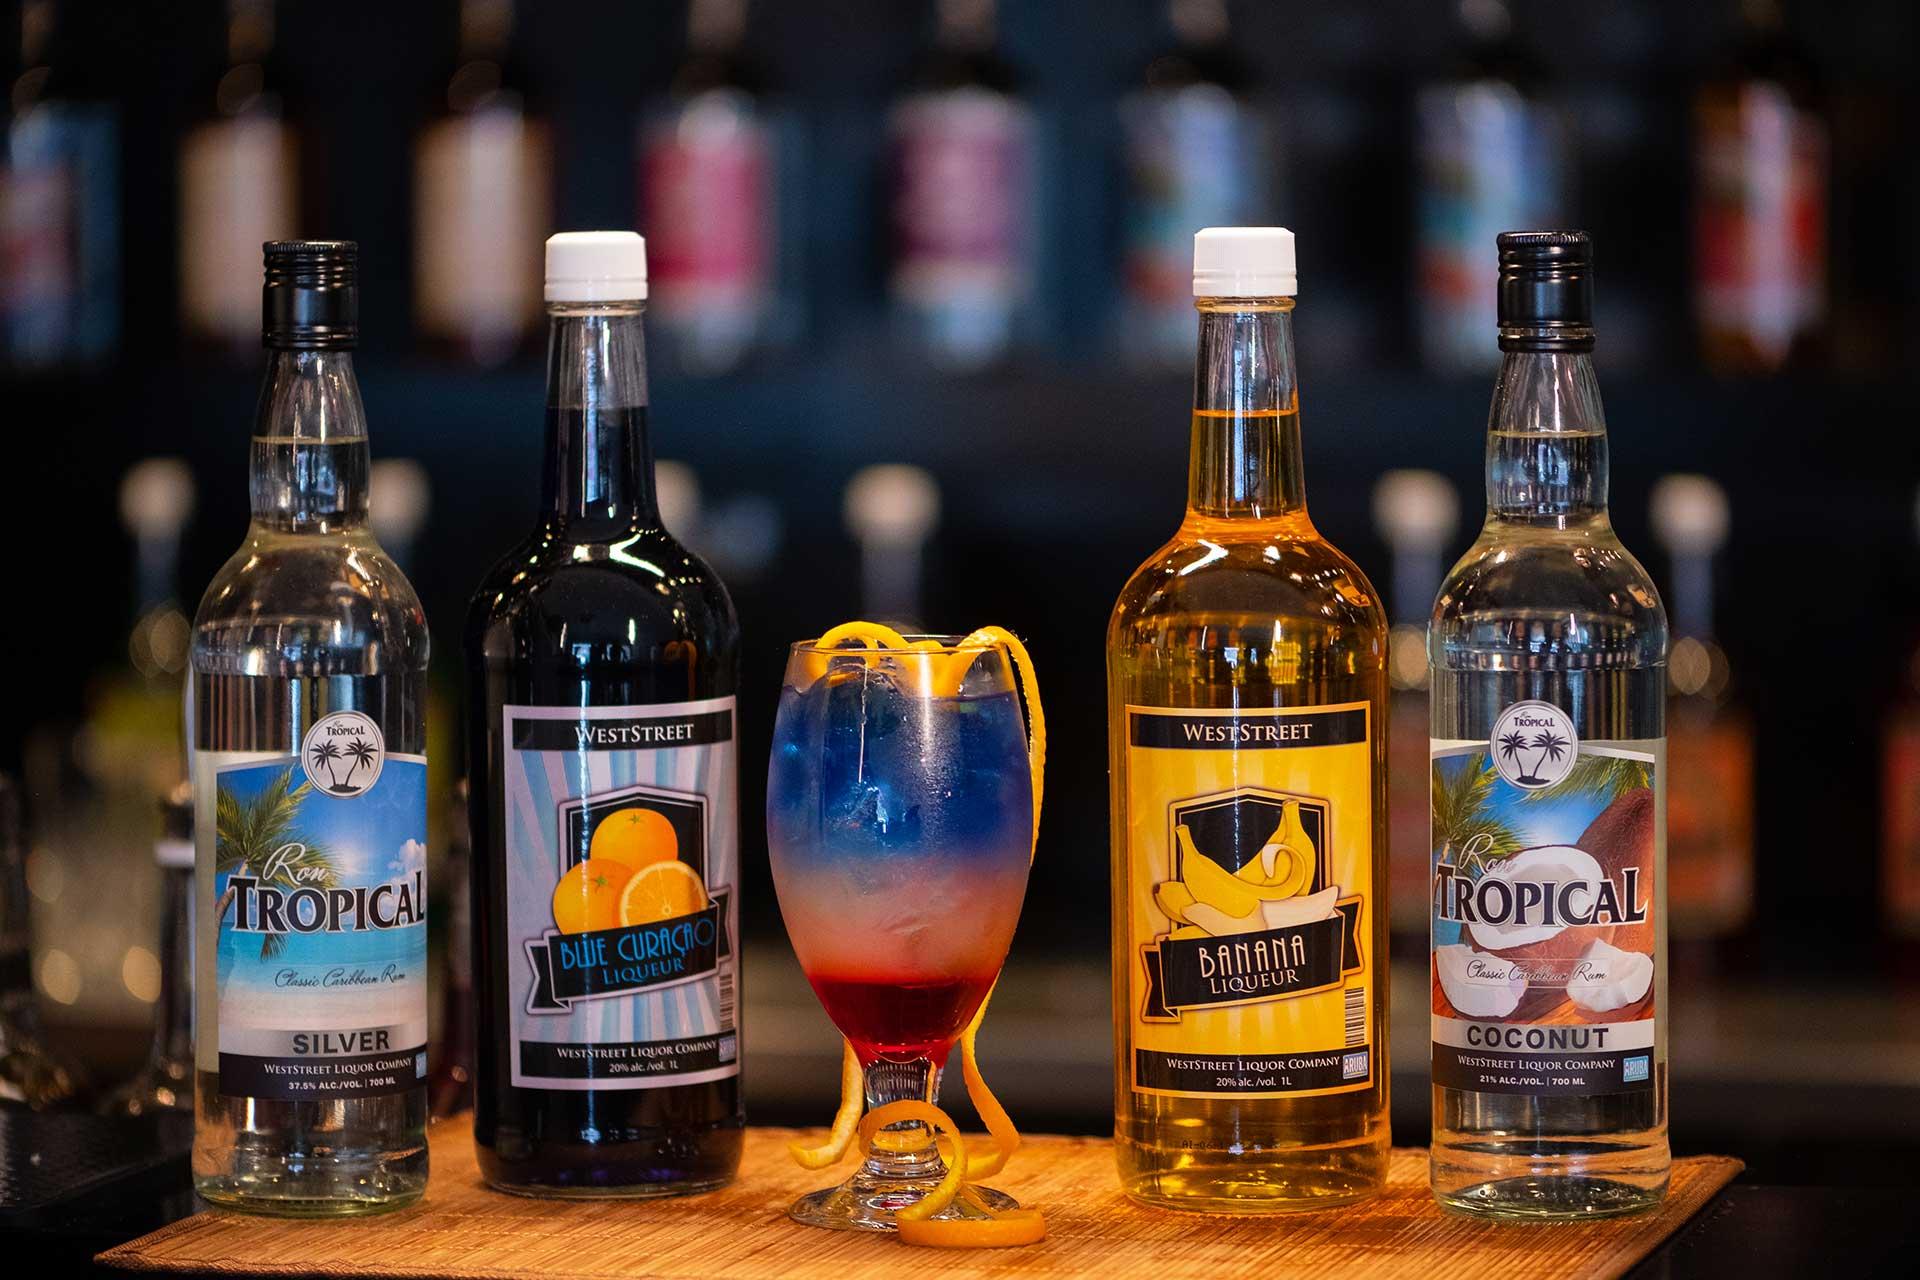 https://weststreetliquorcompany.com/wp-content/uploads/2020/02/WestStreet-Liquor-Company-Drinks-2-1.jpg